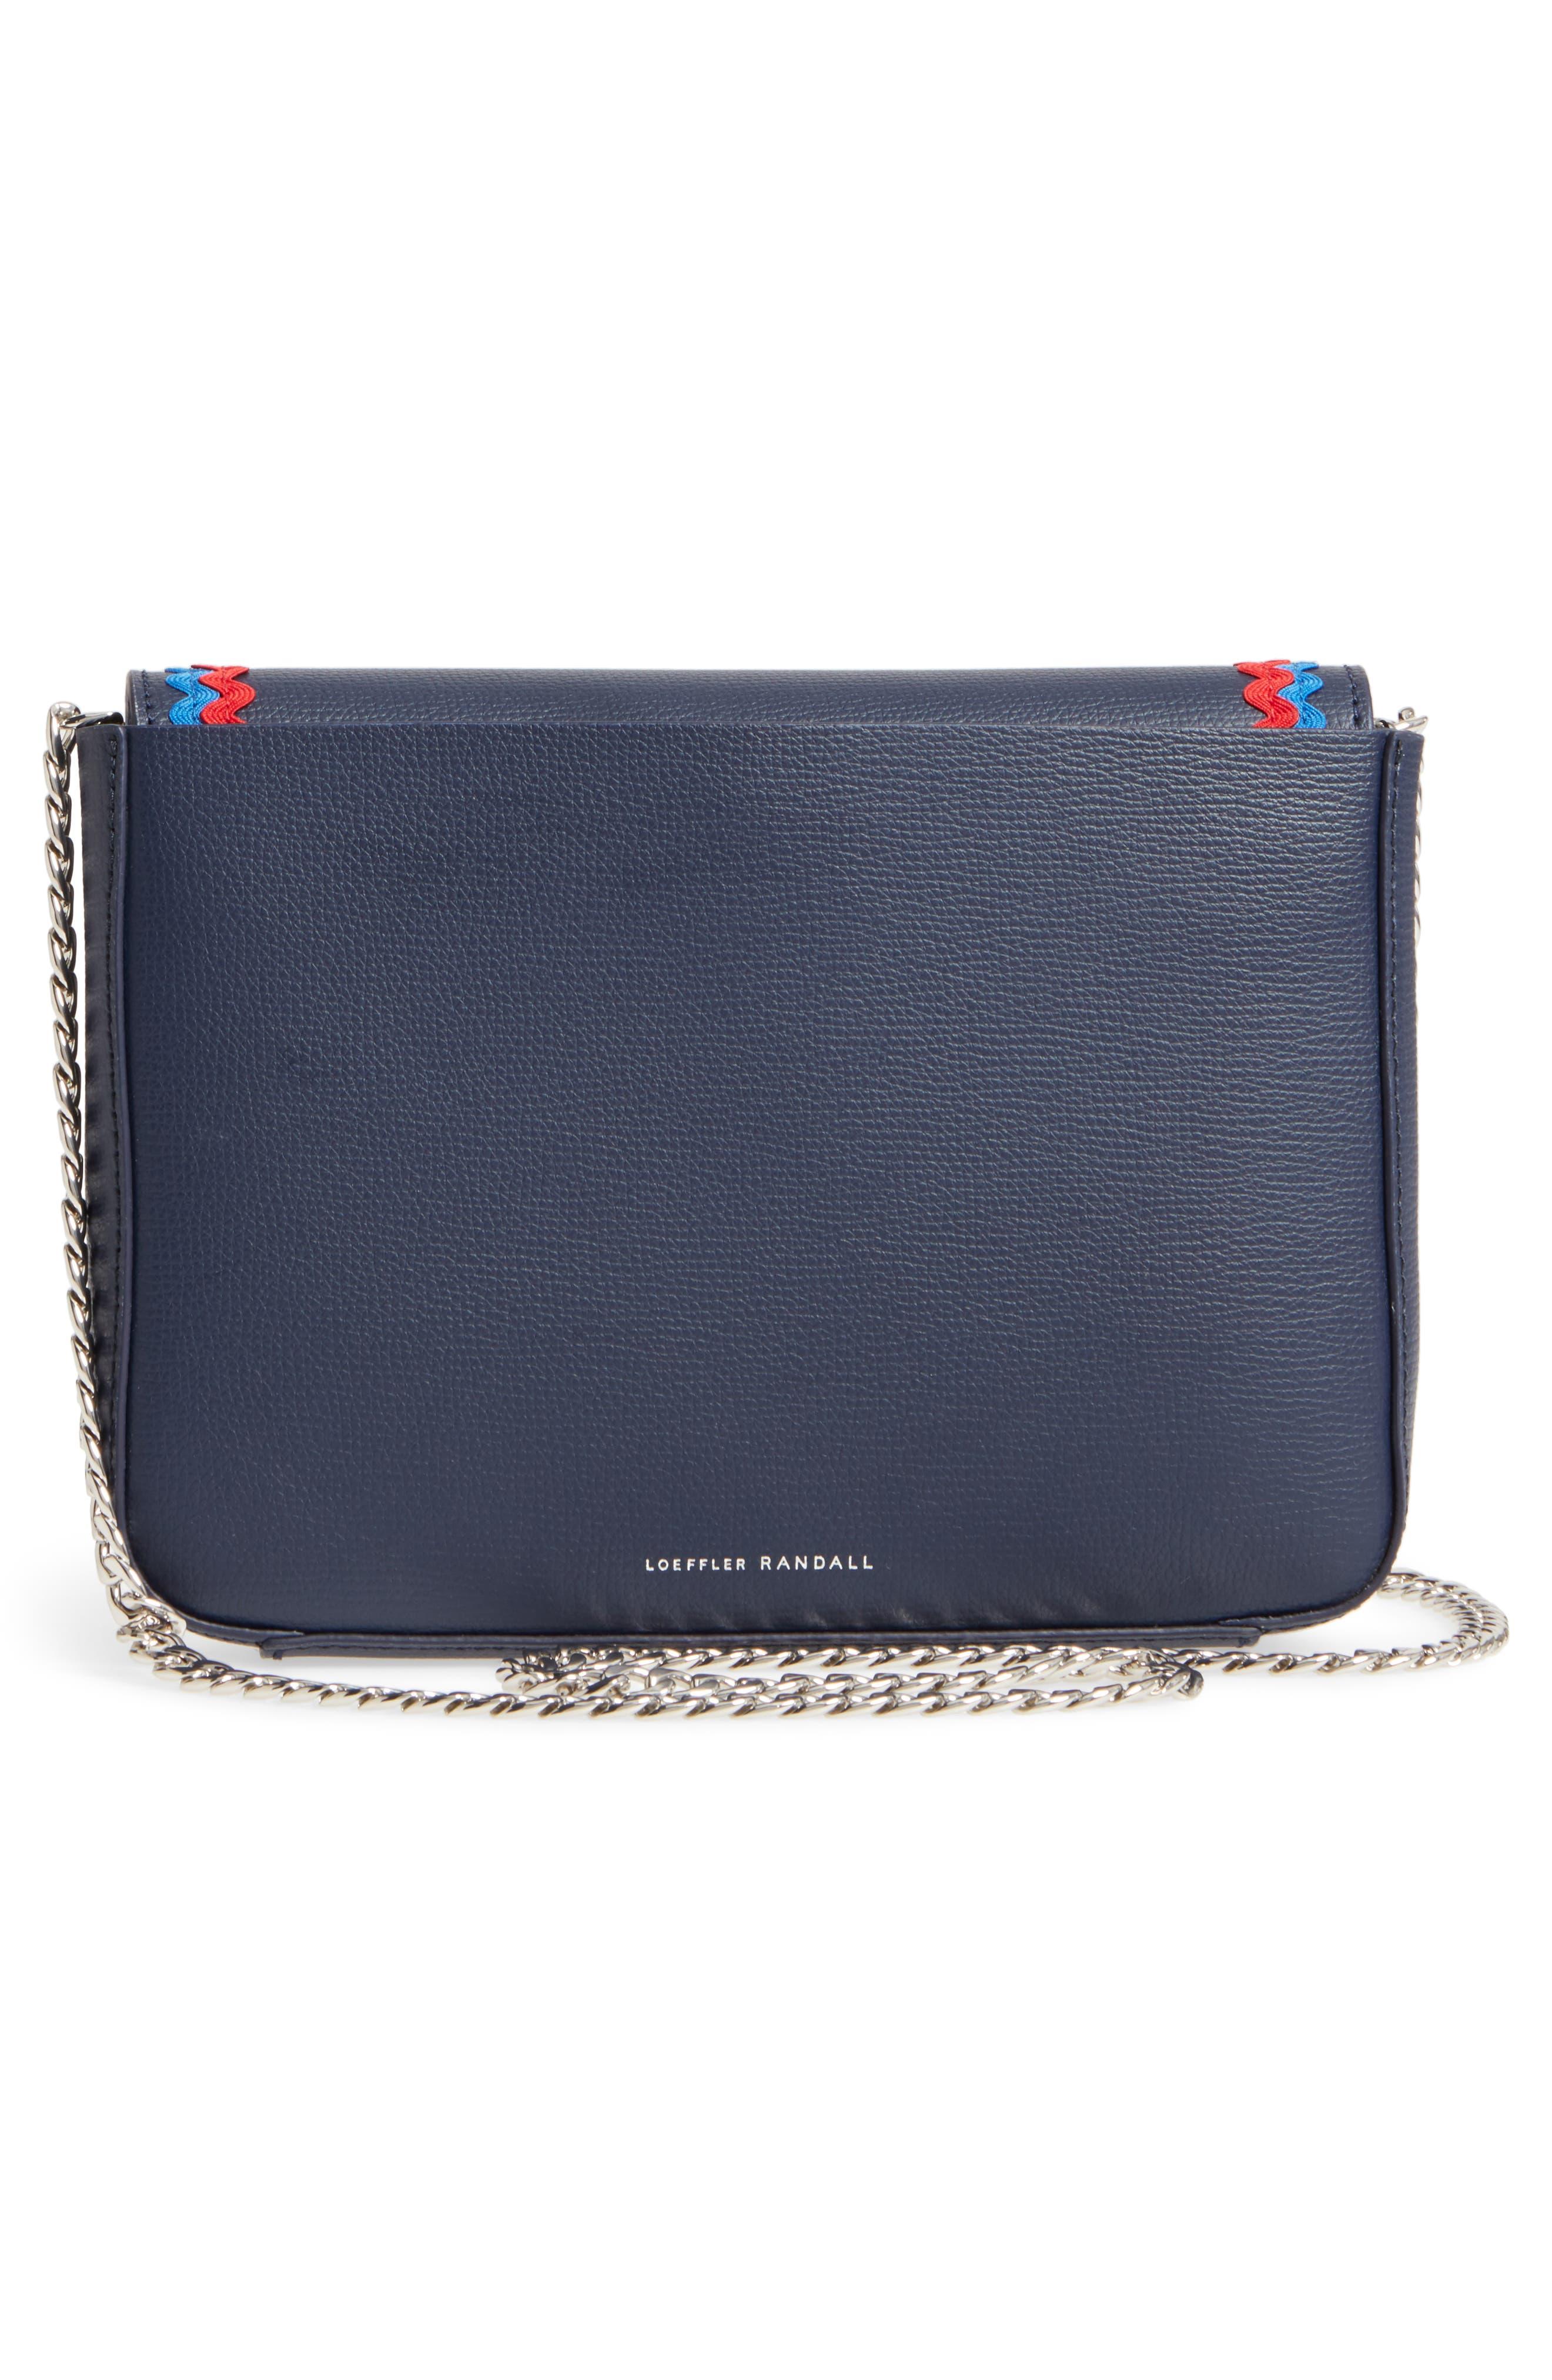 Lock Leather Flap Clutch/Shoulder Bag,                             Alternate thumbnail 3, color,